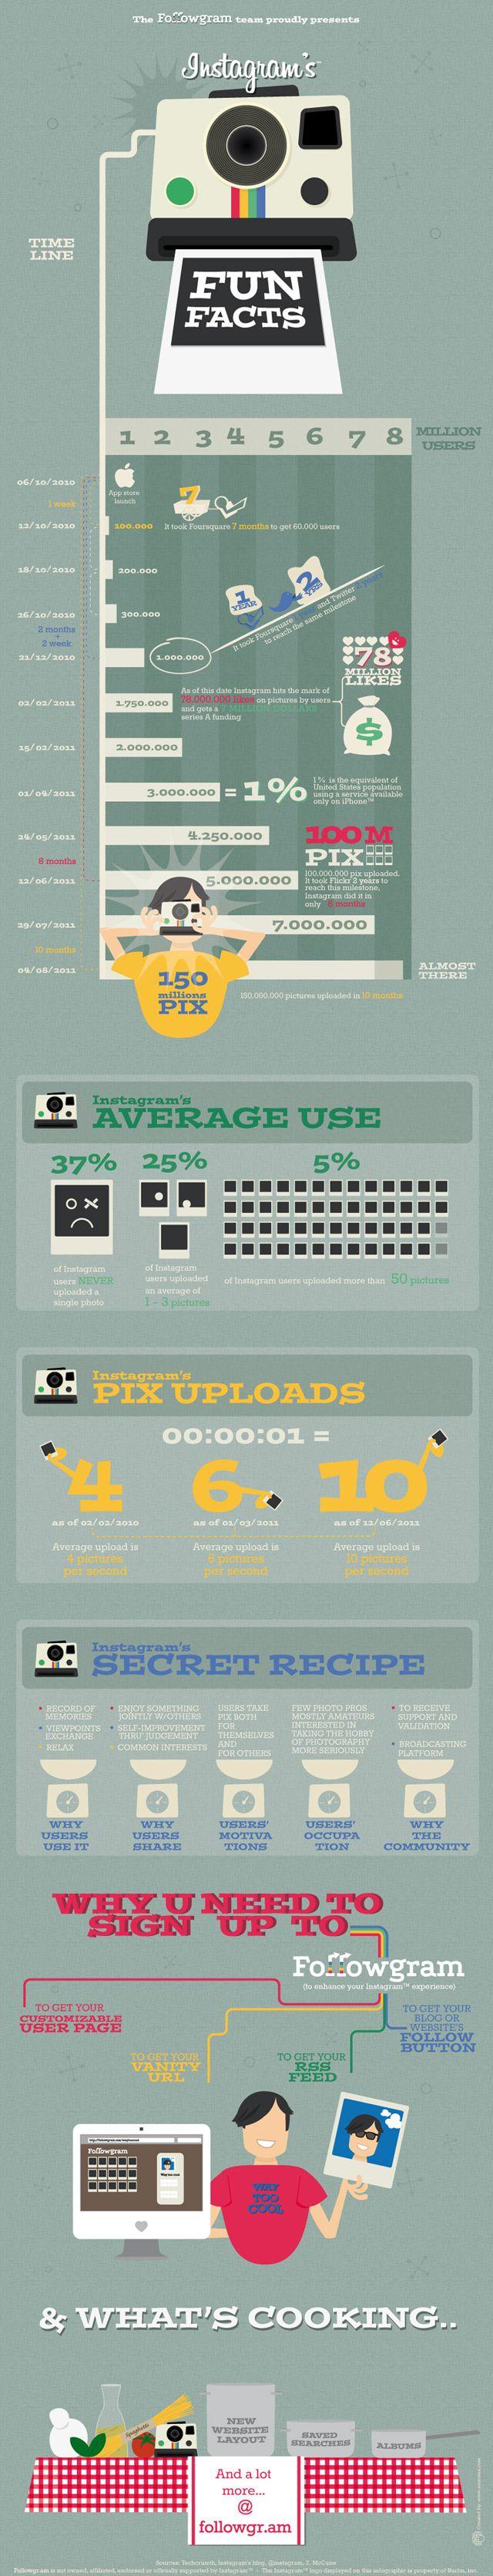 #Instagram #infographic